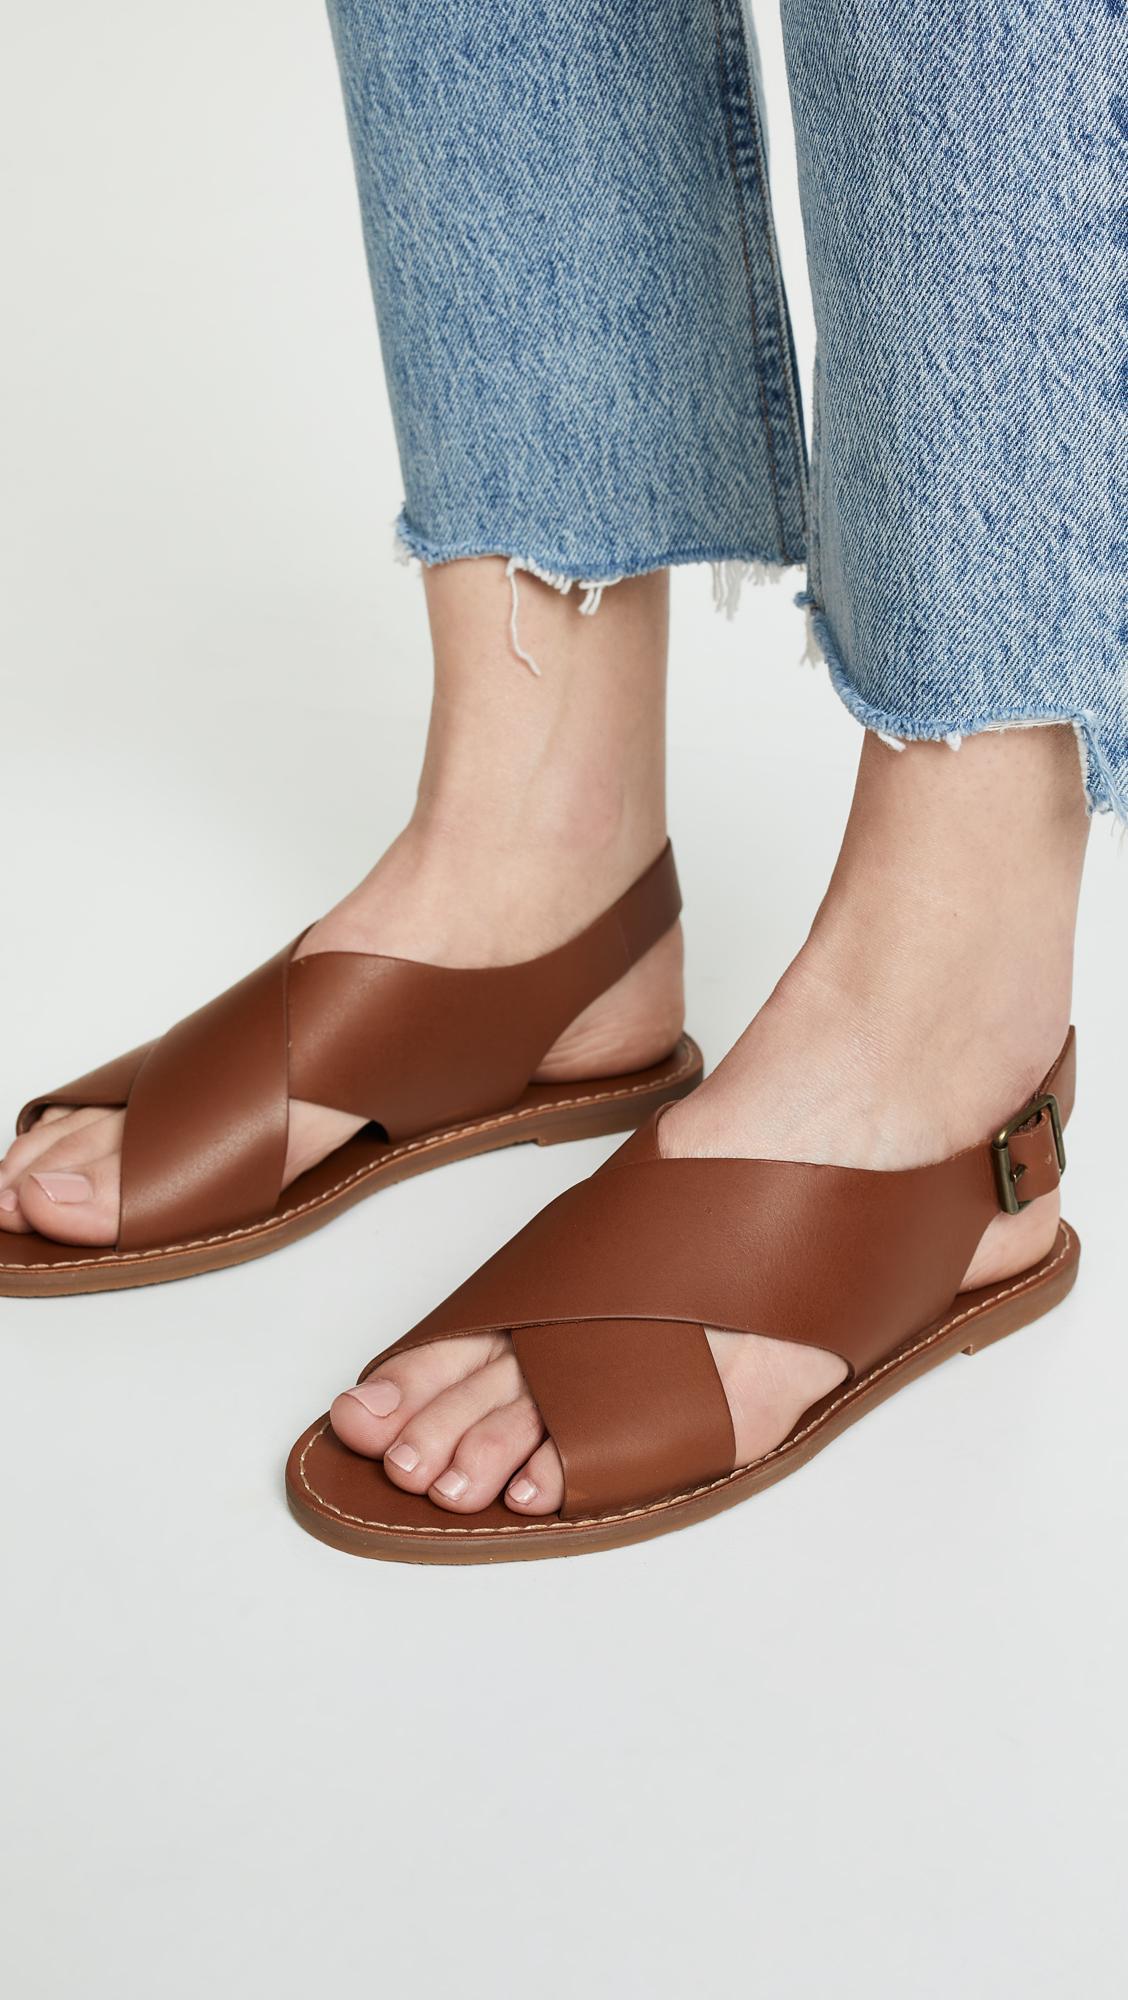 056616a0897e Madewell Boardwalk Crossover Sandals | SHOPBOP